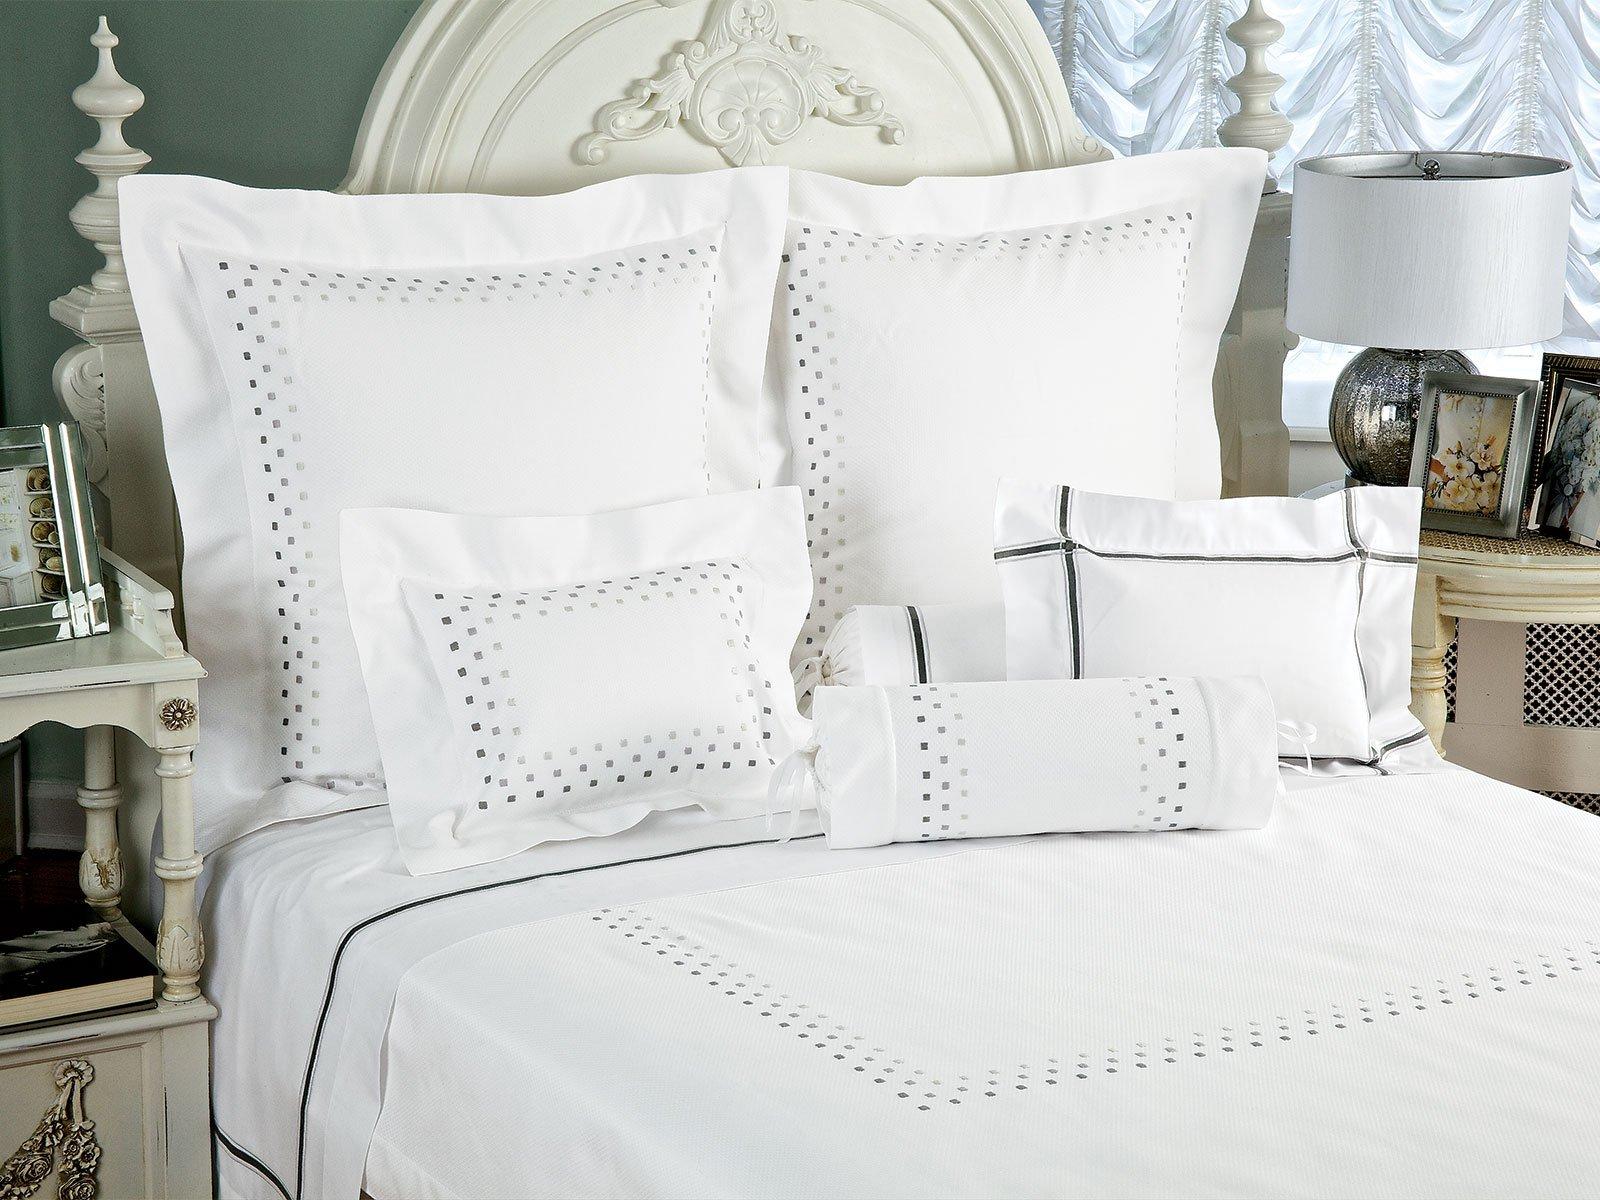 Trafalgar Square Luxury Bedding Italian Bed Linens